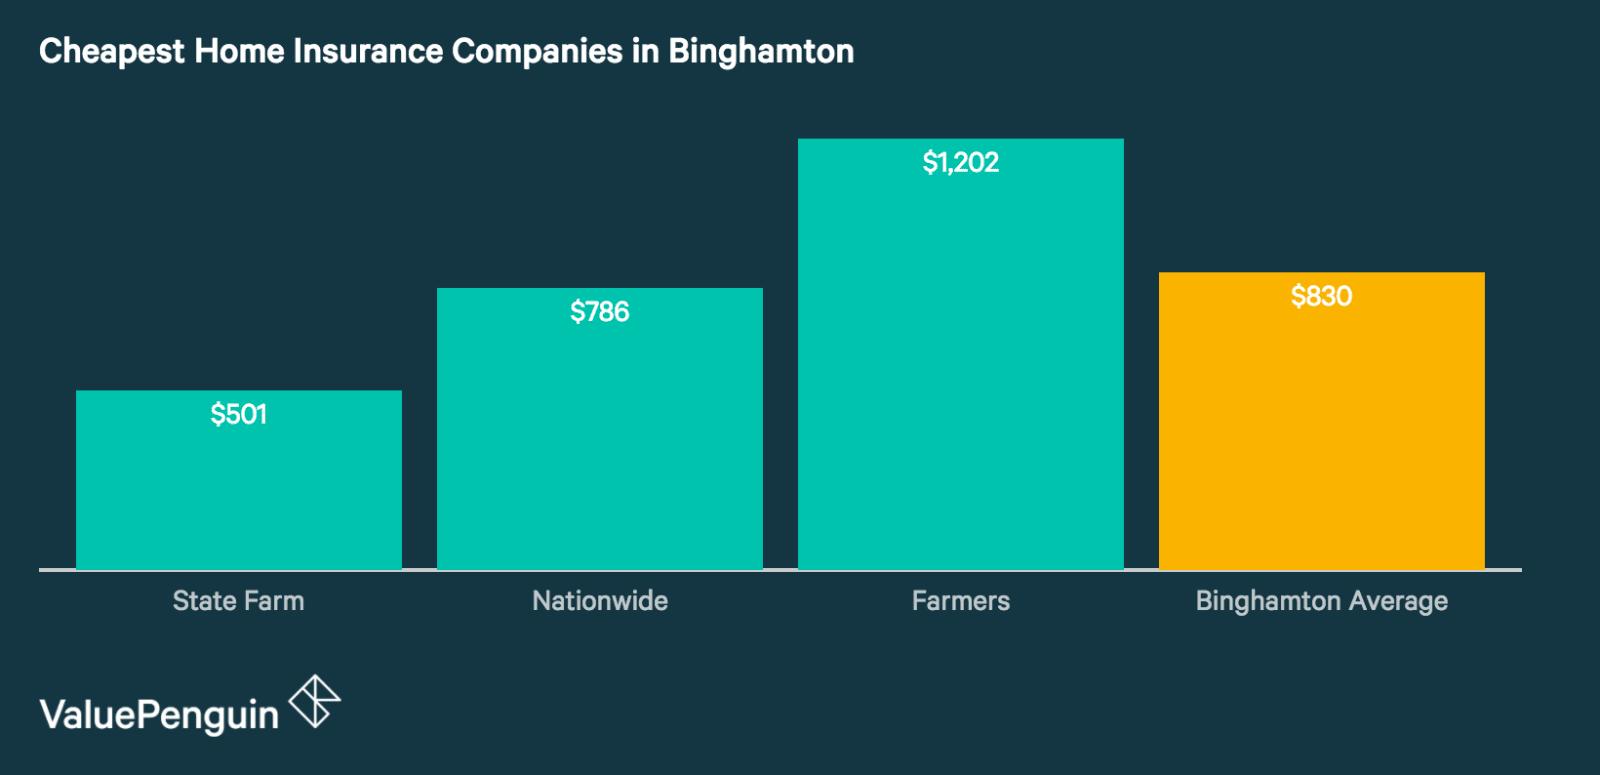 Cheap Home Insurance Companies in Binghamton